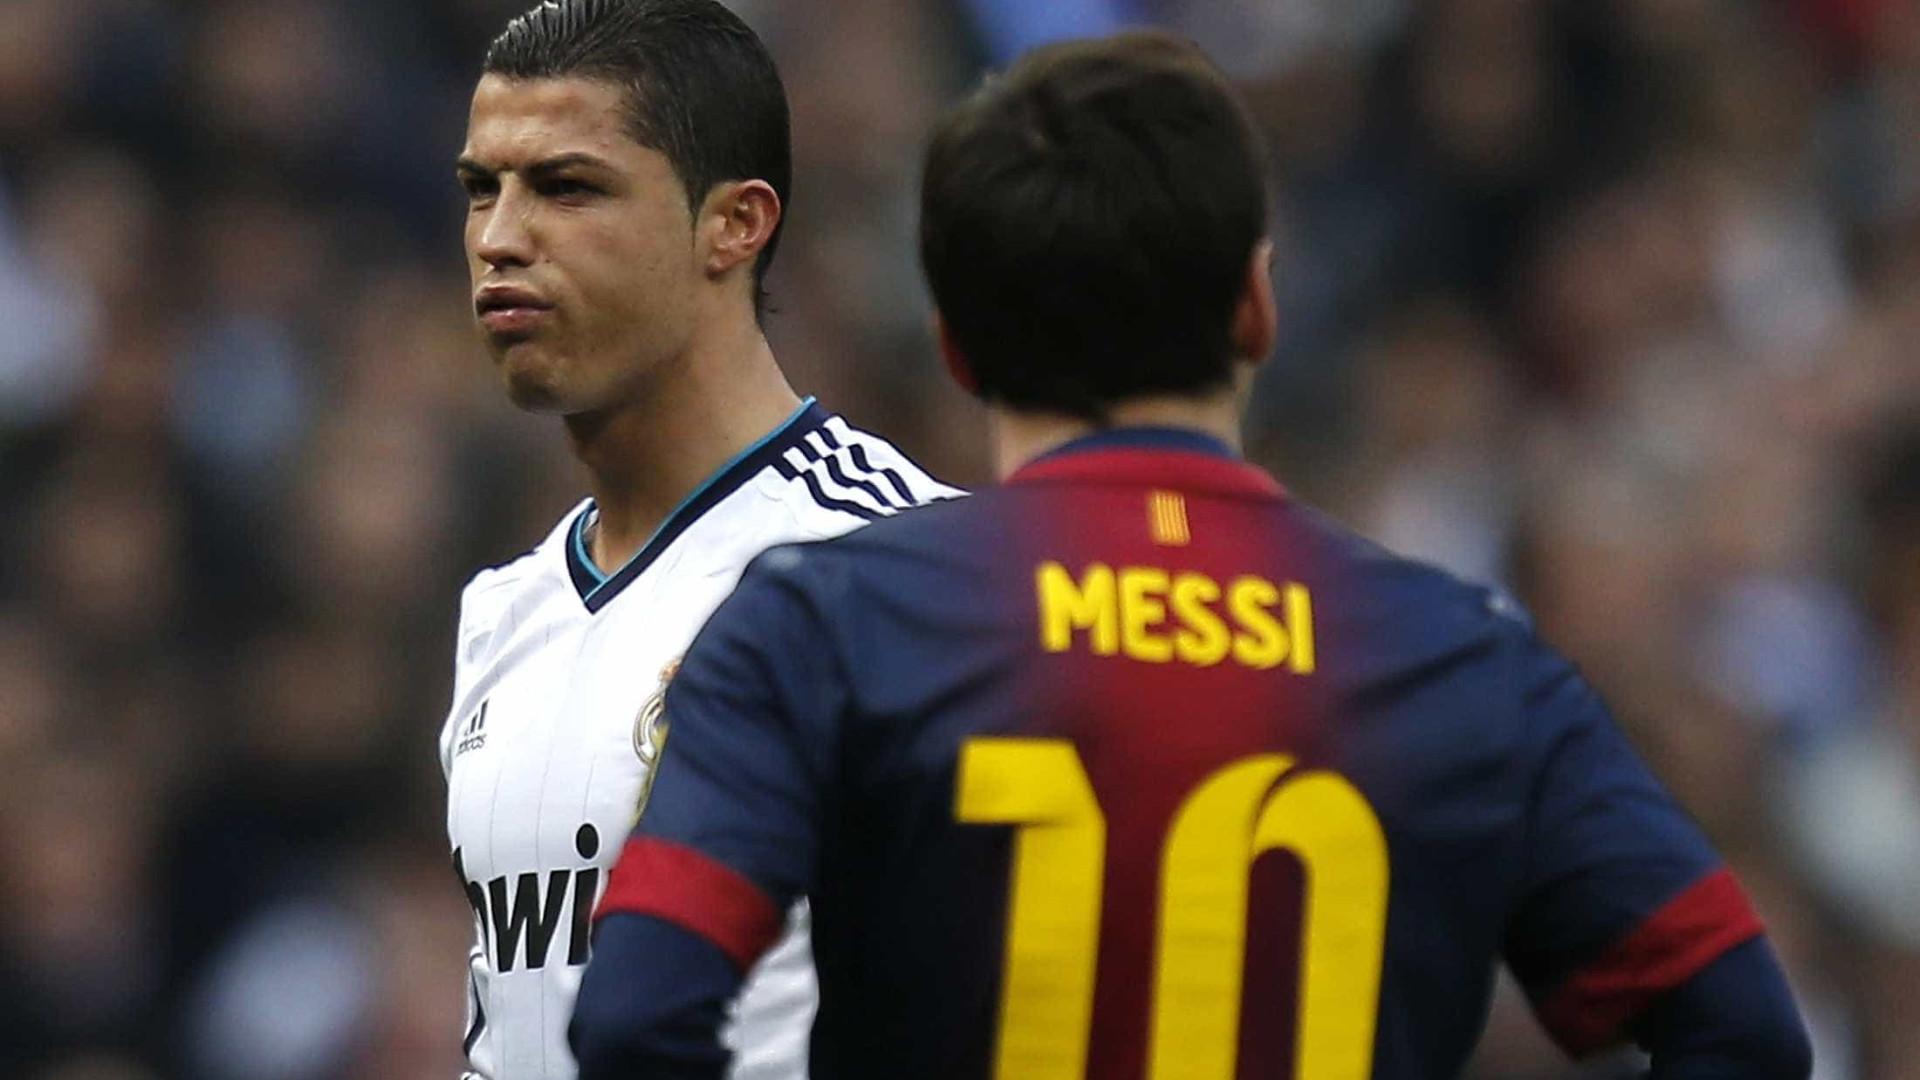 Messi responde a desafio de CR7 para jogar na Itália